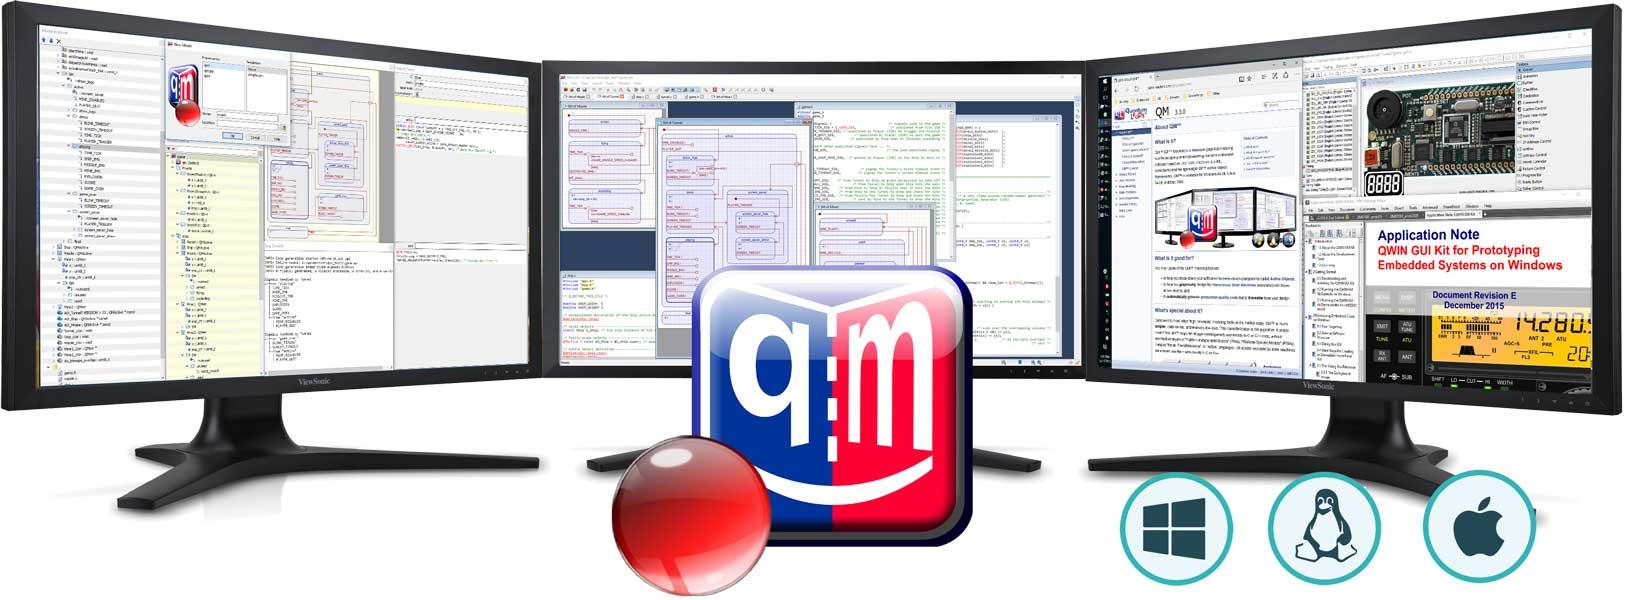 QM modeling tool logo and three monitors